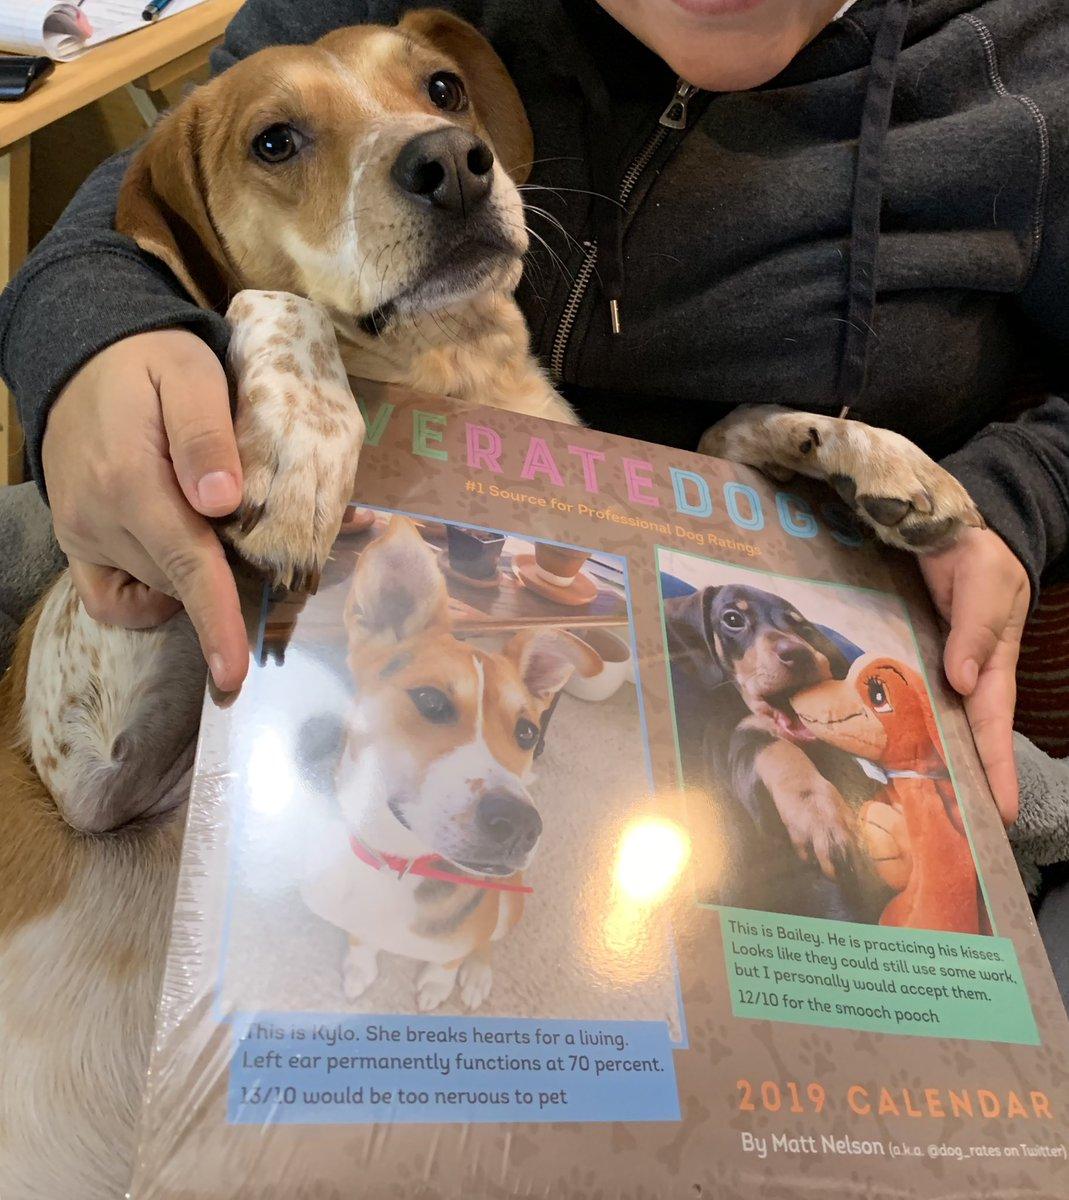 We got our calendar! @dog_rates